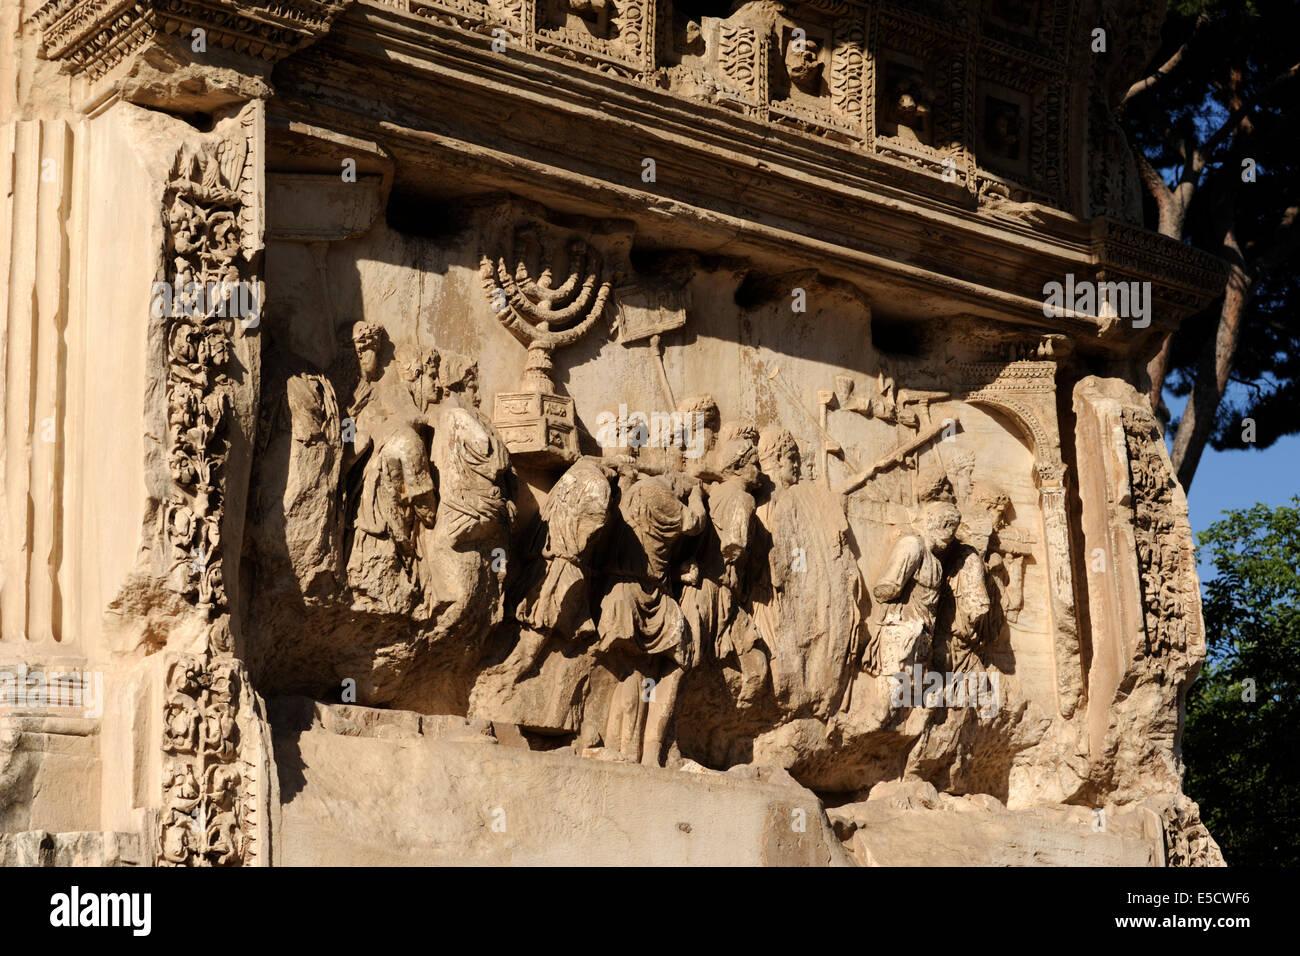 italy, rome, roman forum, arch of titus, bas relief - Stock Image